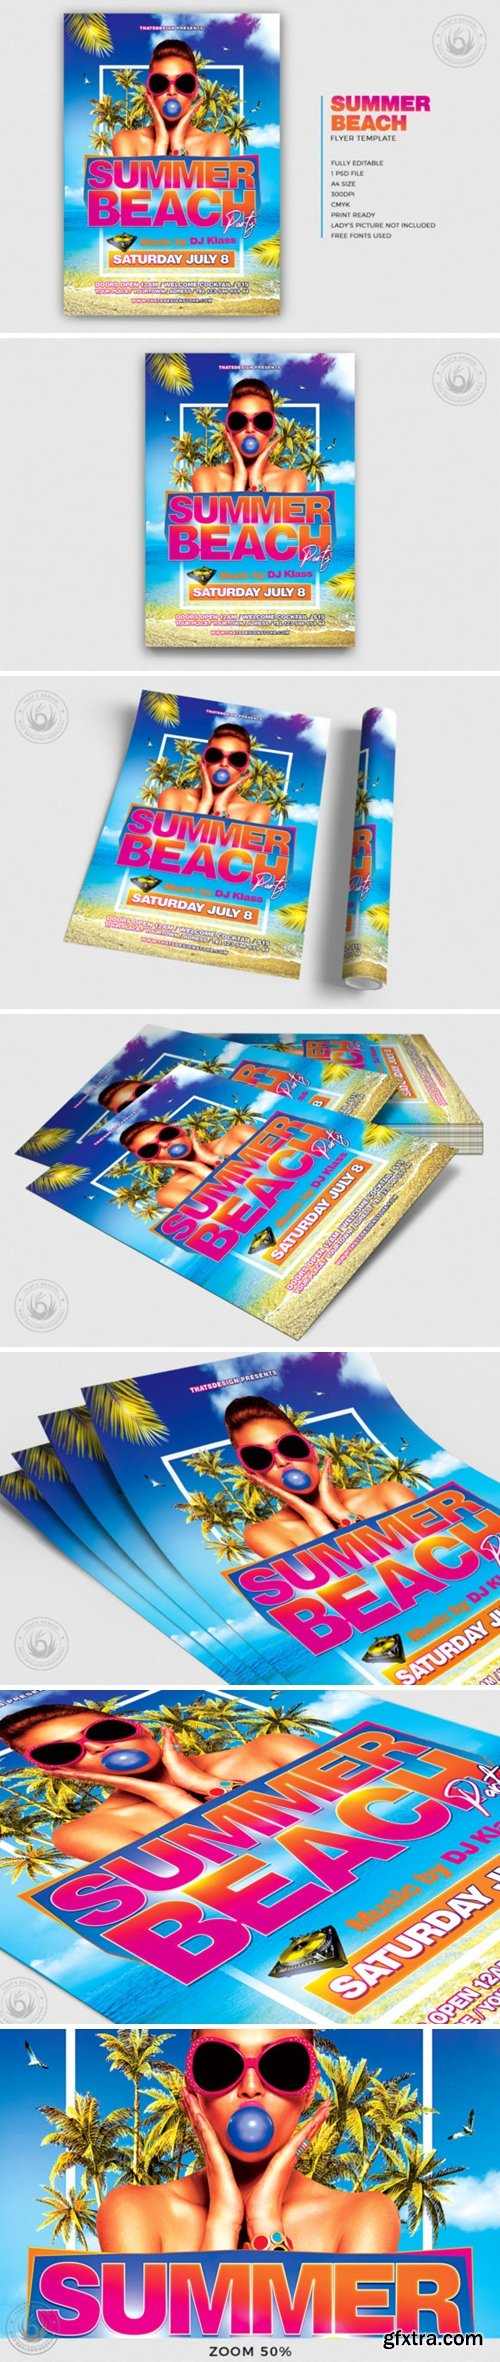 CM - Summer Beach Flyer Template V4 3950125